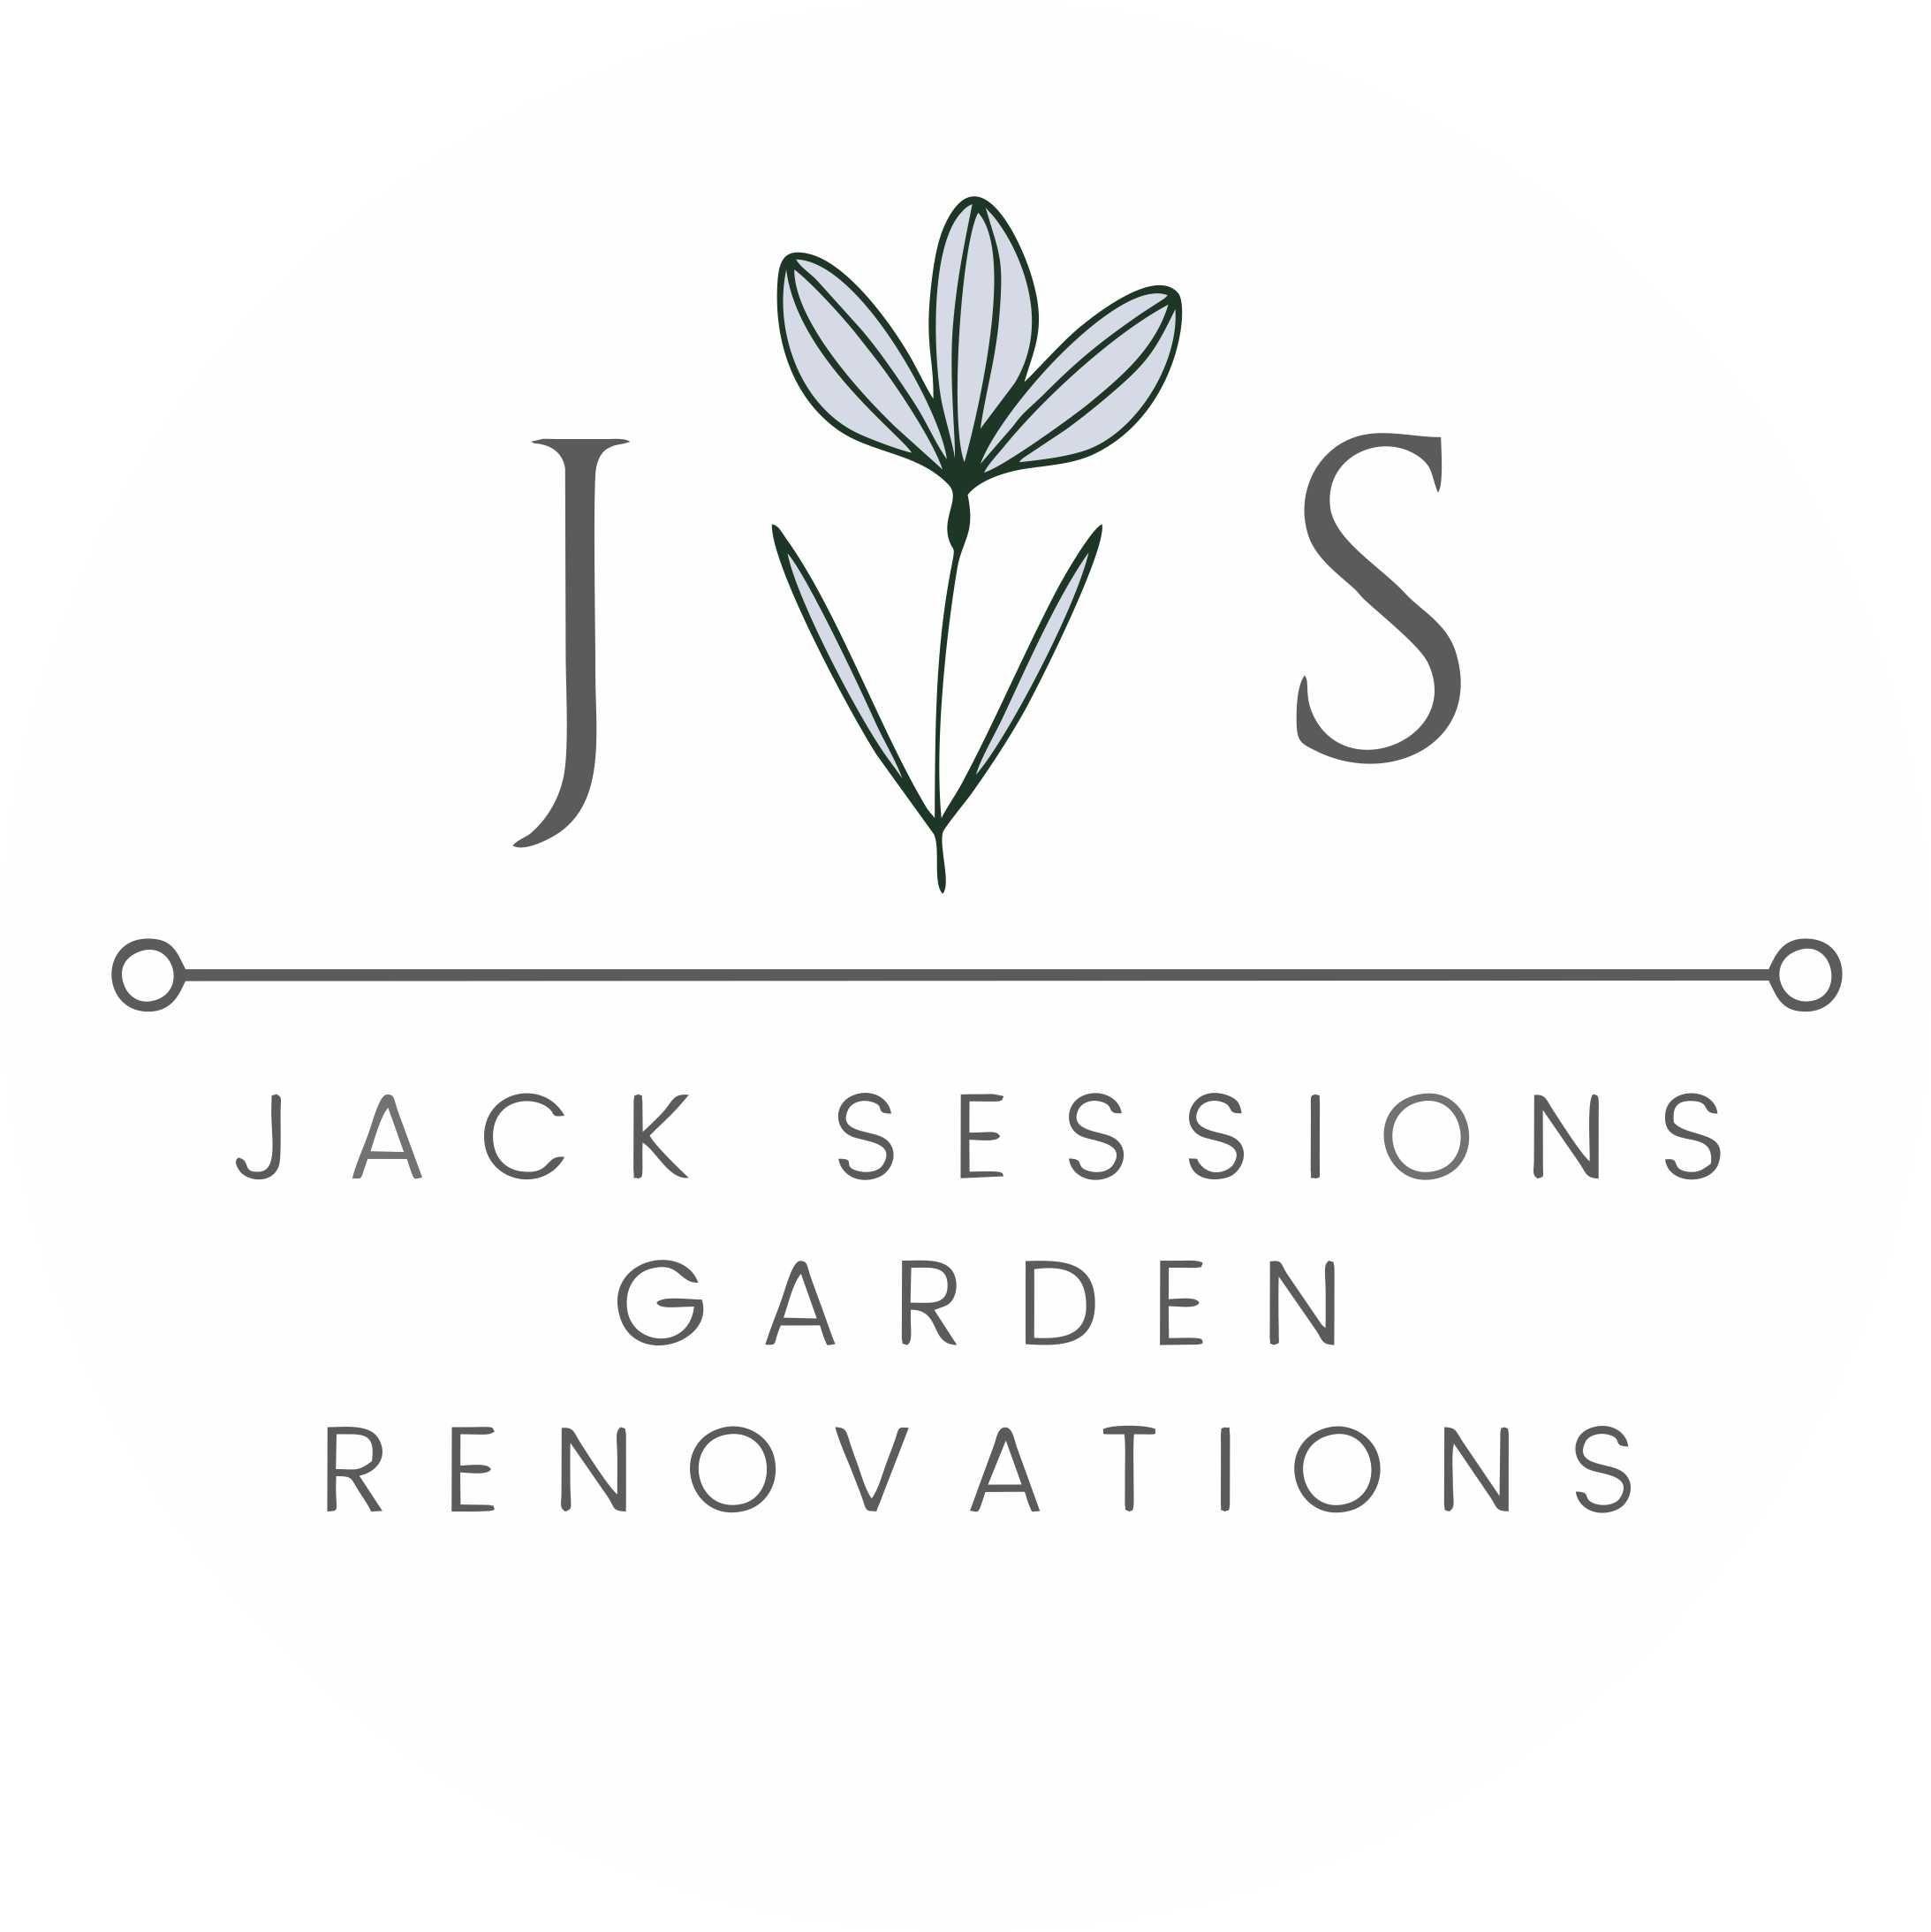 Jack Sessions- Jack Sessions Garden Renovations